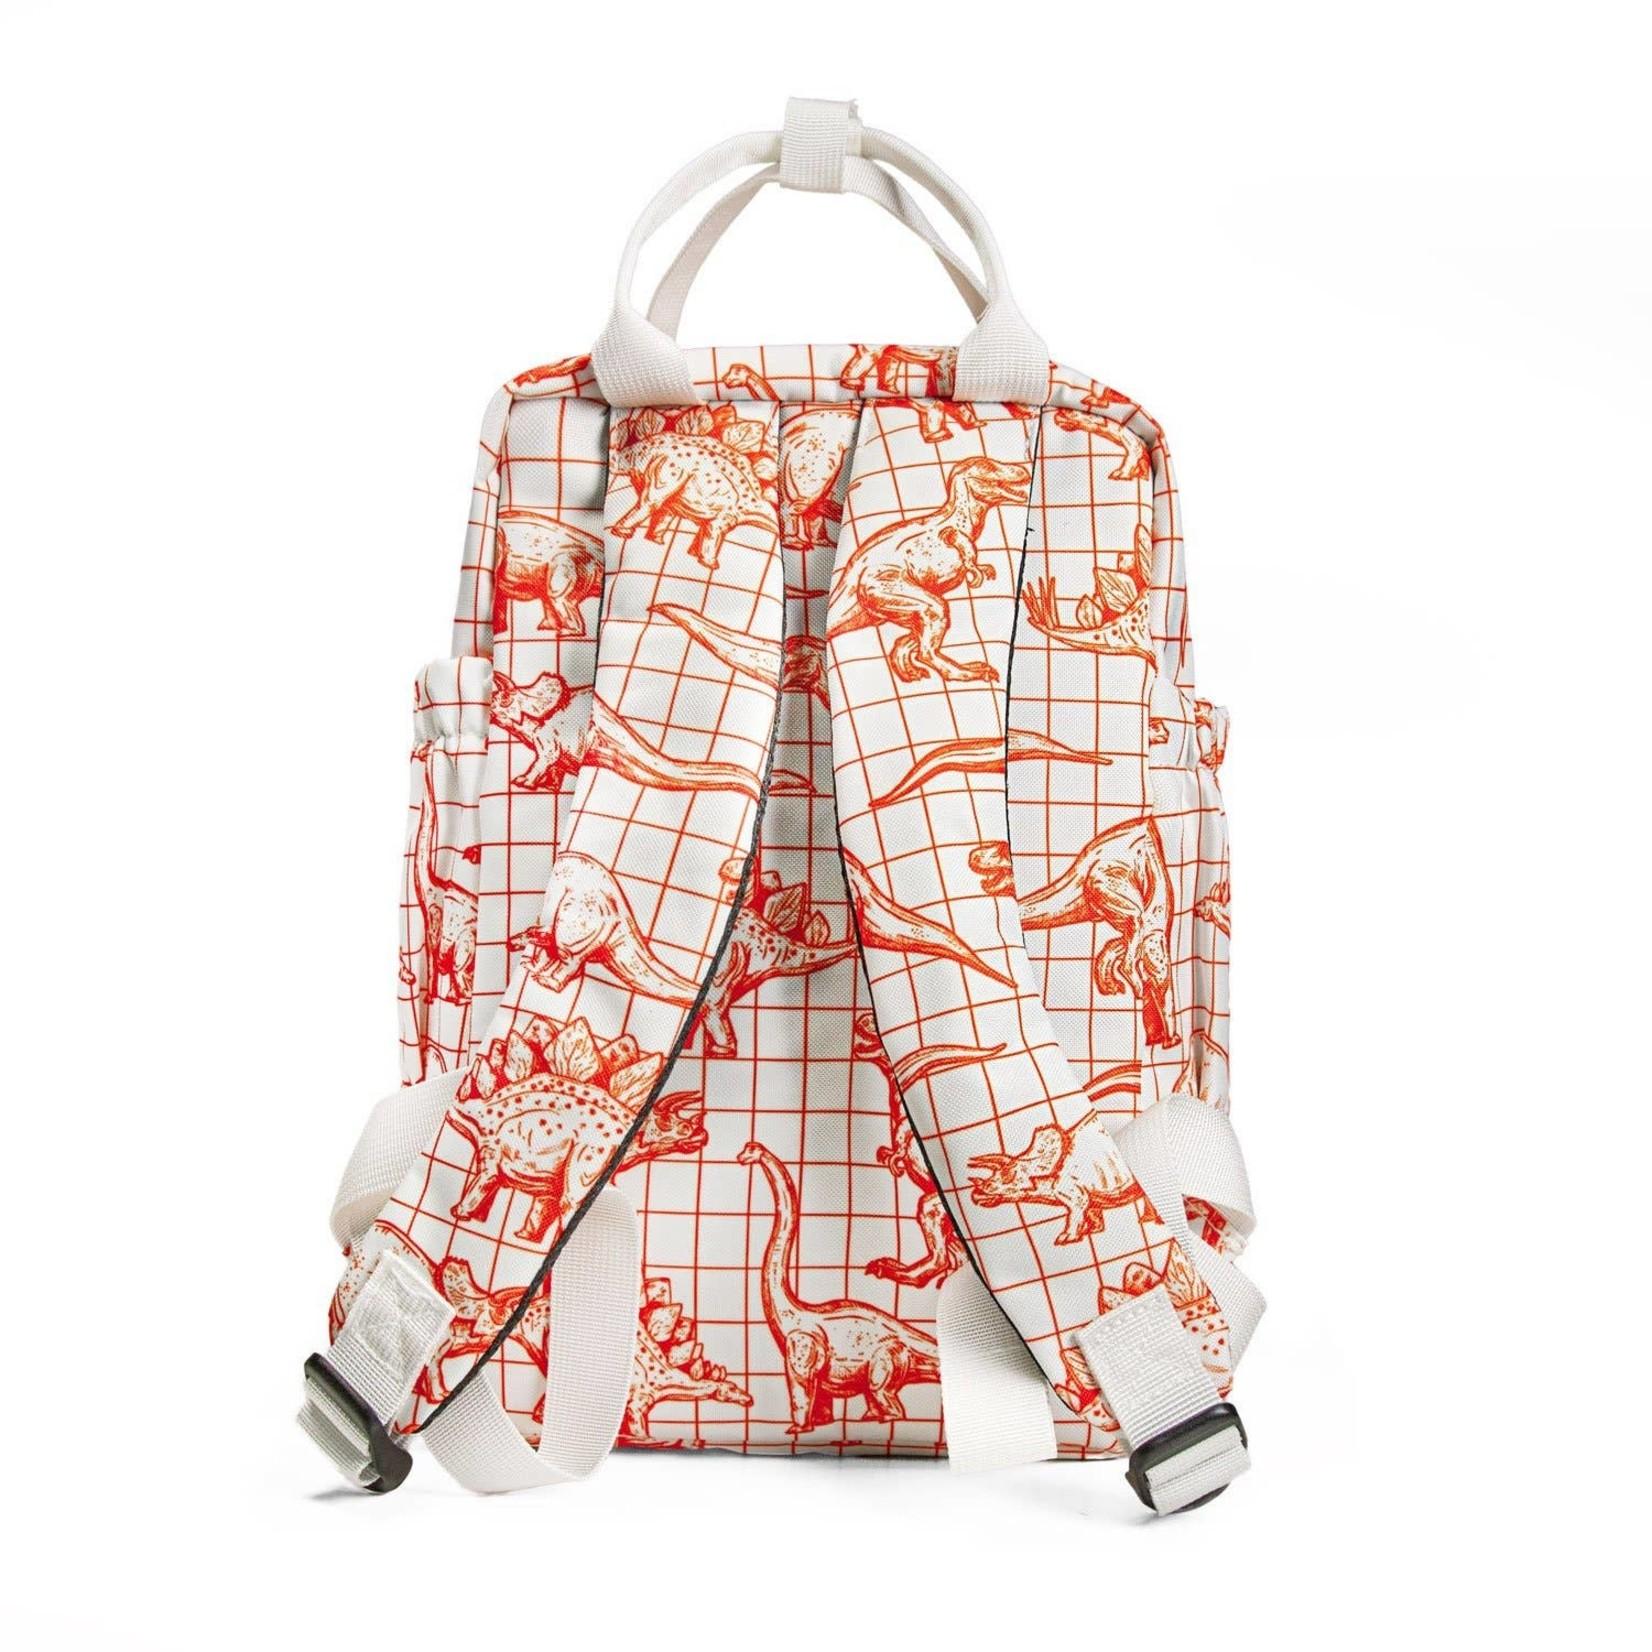 Dinomite Backpack